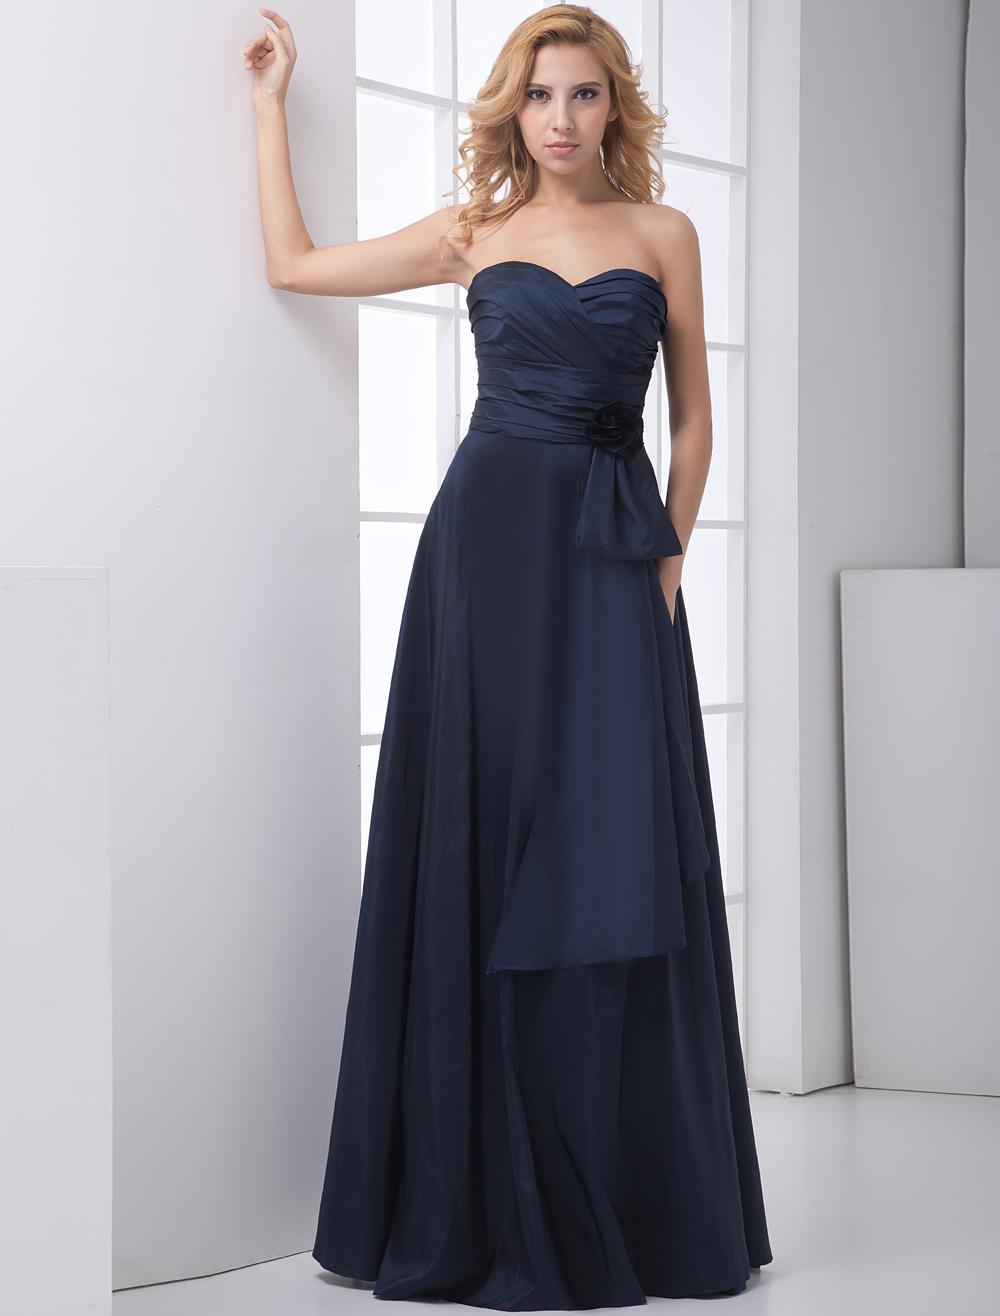 Buy A-line Dark Navy Sweetheart Neck Floor-Length Bridesmaid Dress for $104.39 in Milanoo store